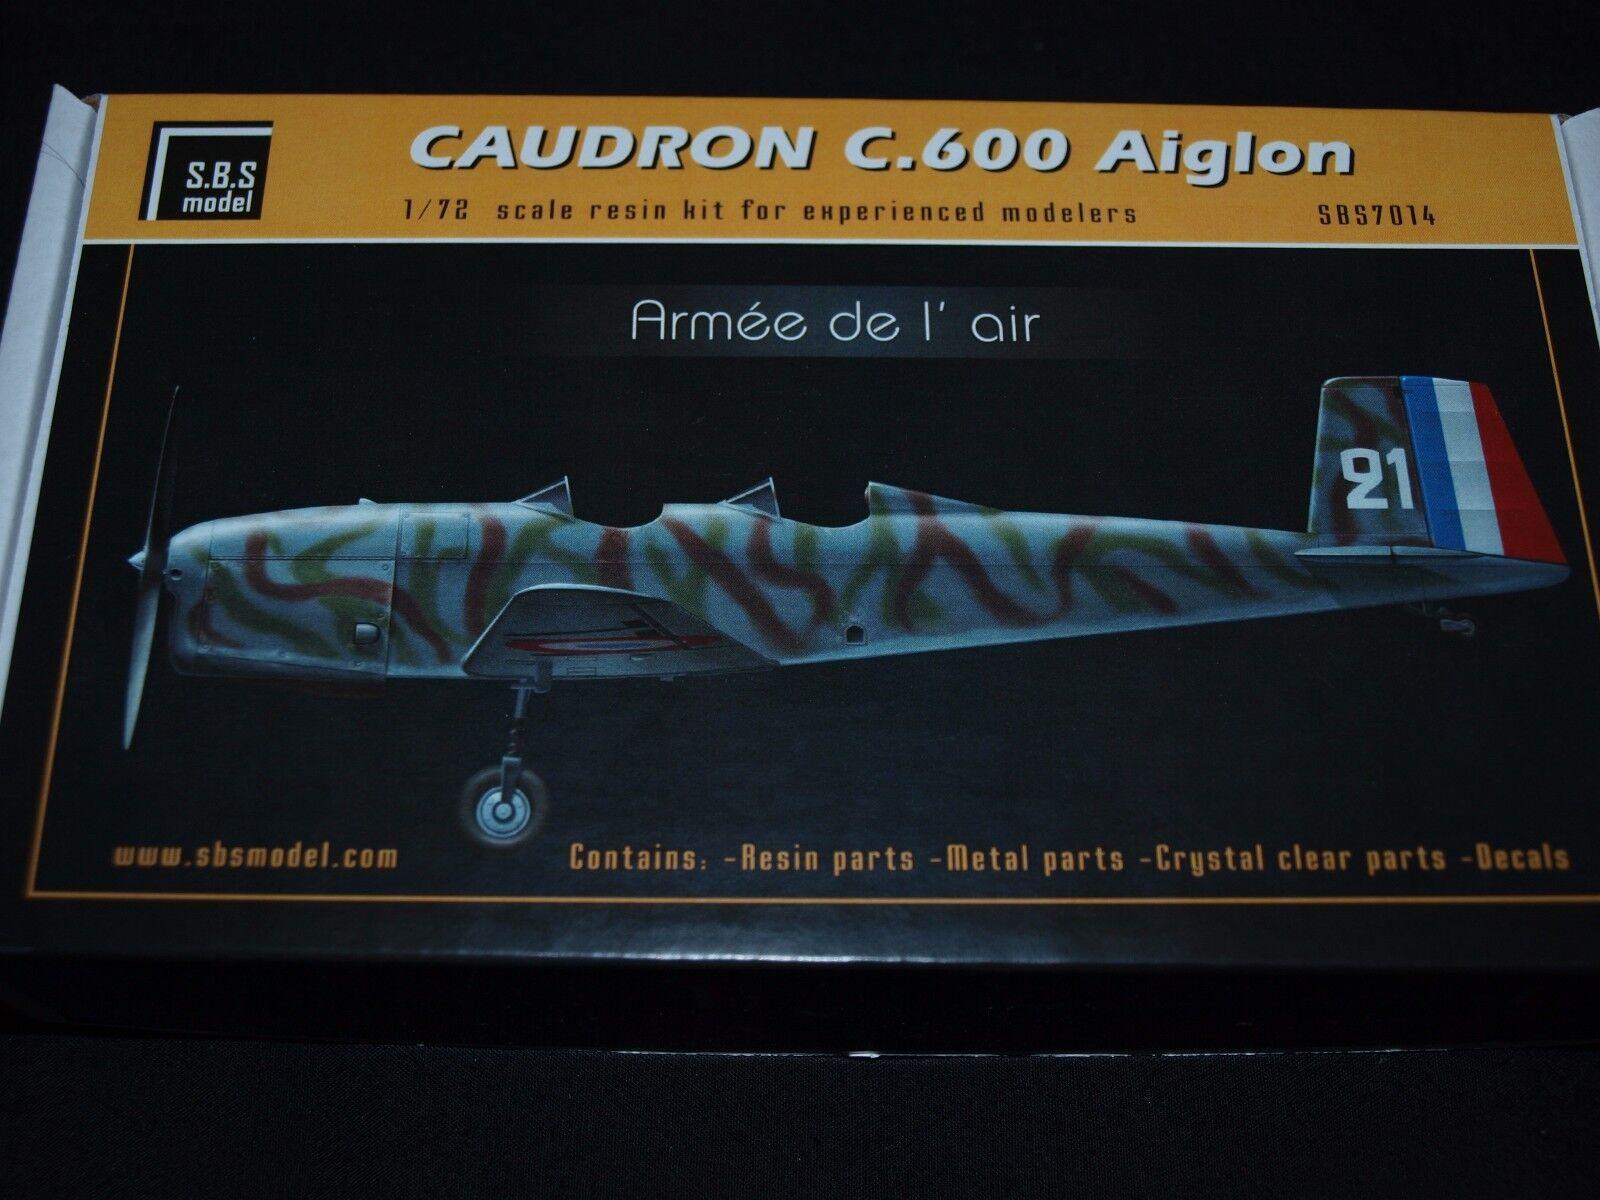 S.B.S modellllerler, 1 72, 704, Caudron C.600 Aiglon'ARMEE DE l'AIR 'komplett kit